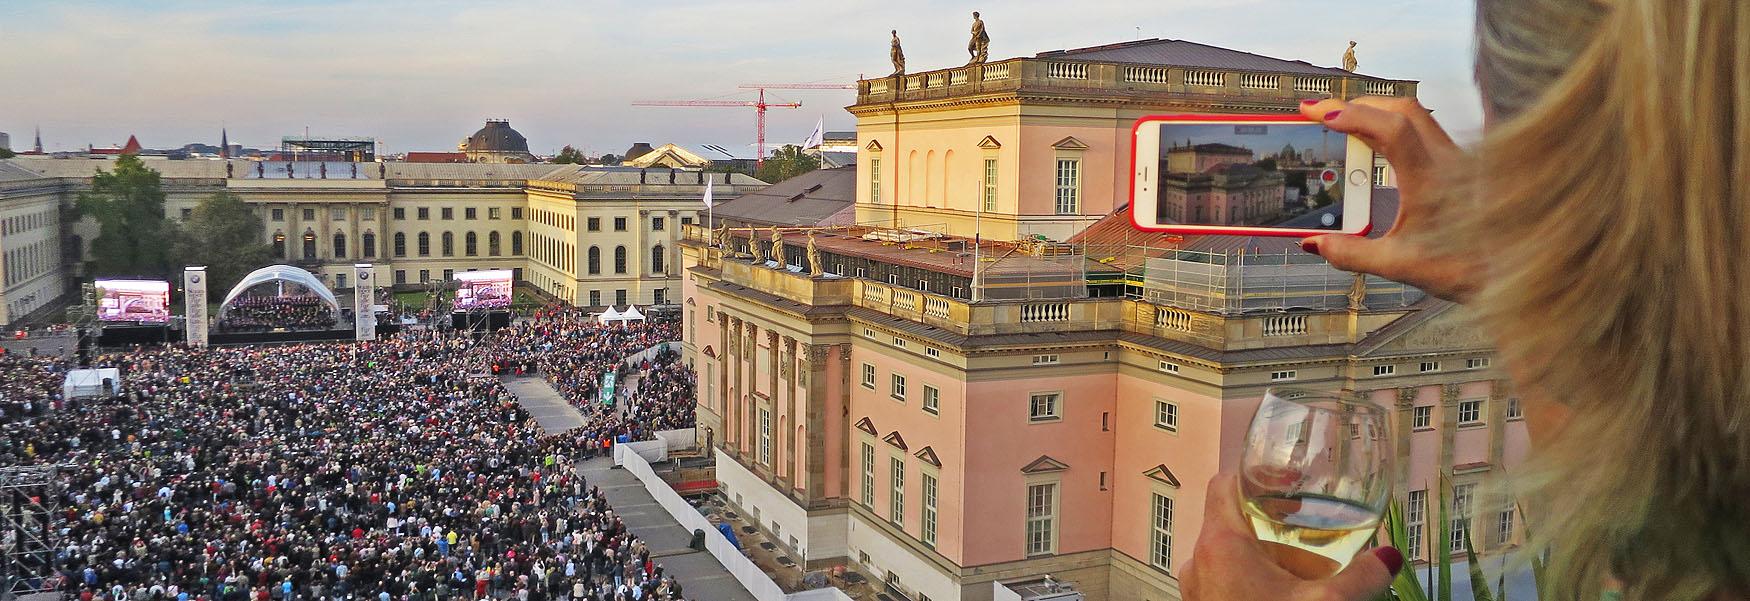 Staatsoper Für Alle Berlin 2017